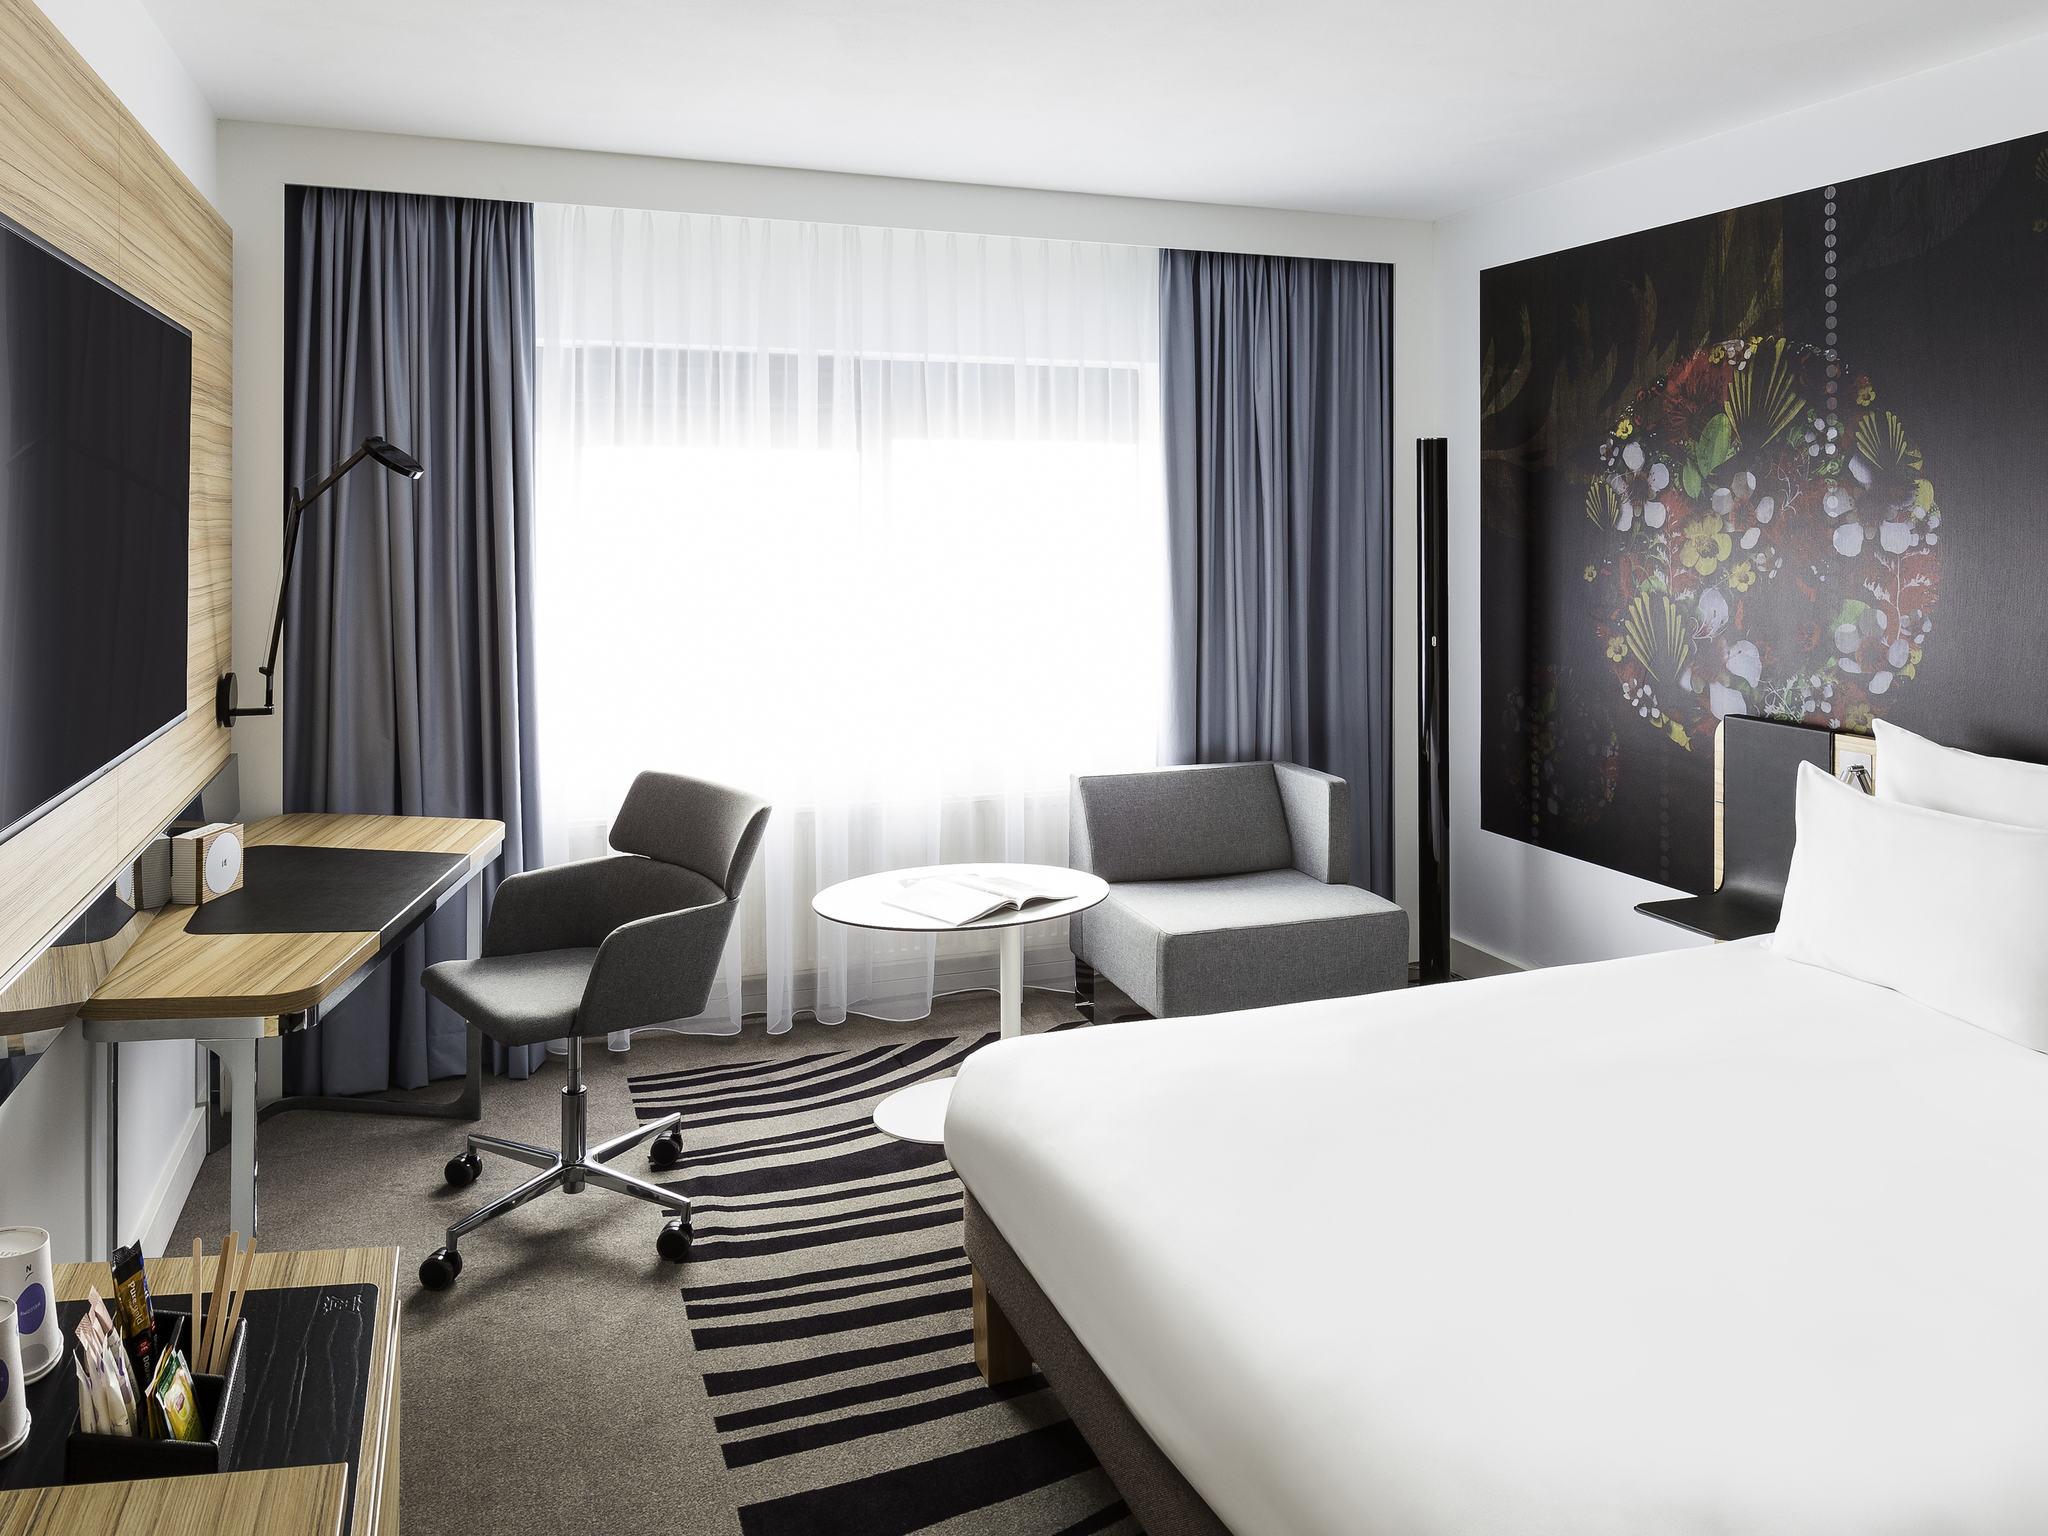 Family Hotel Amsterdam City - Novotel - Near Amsterdam RAI